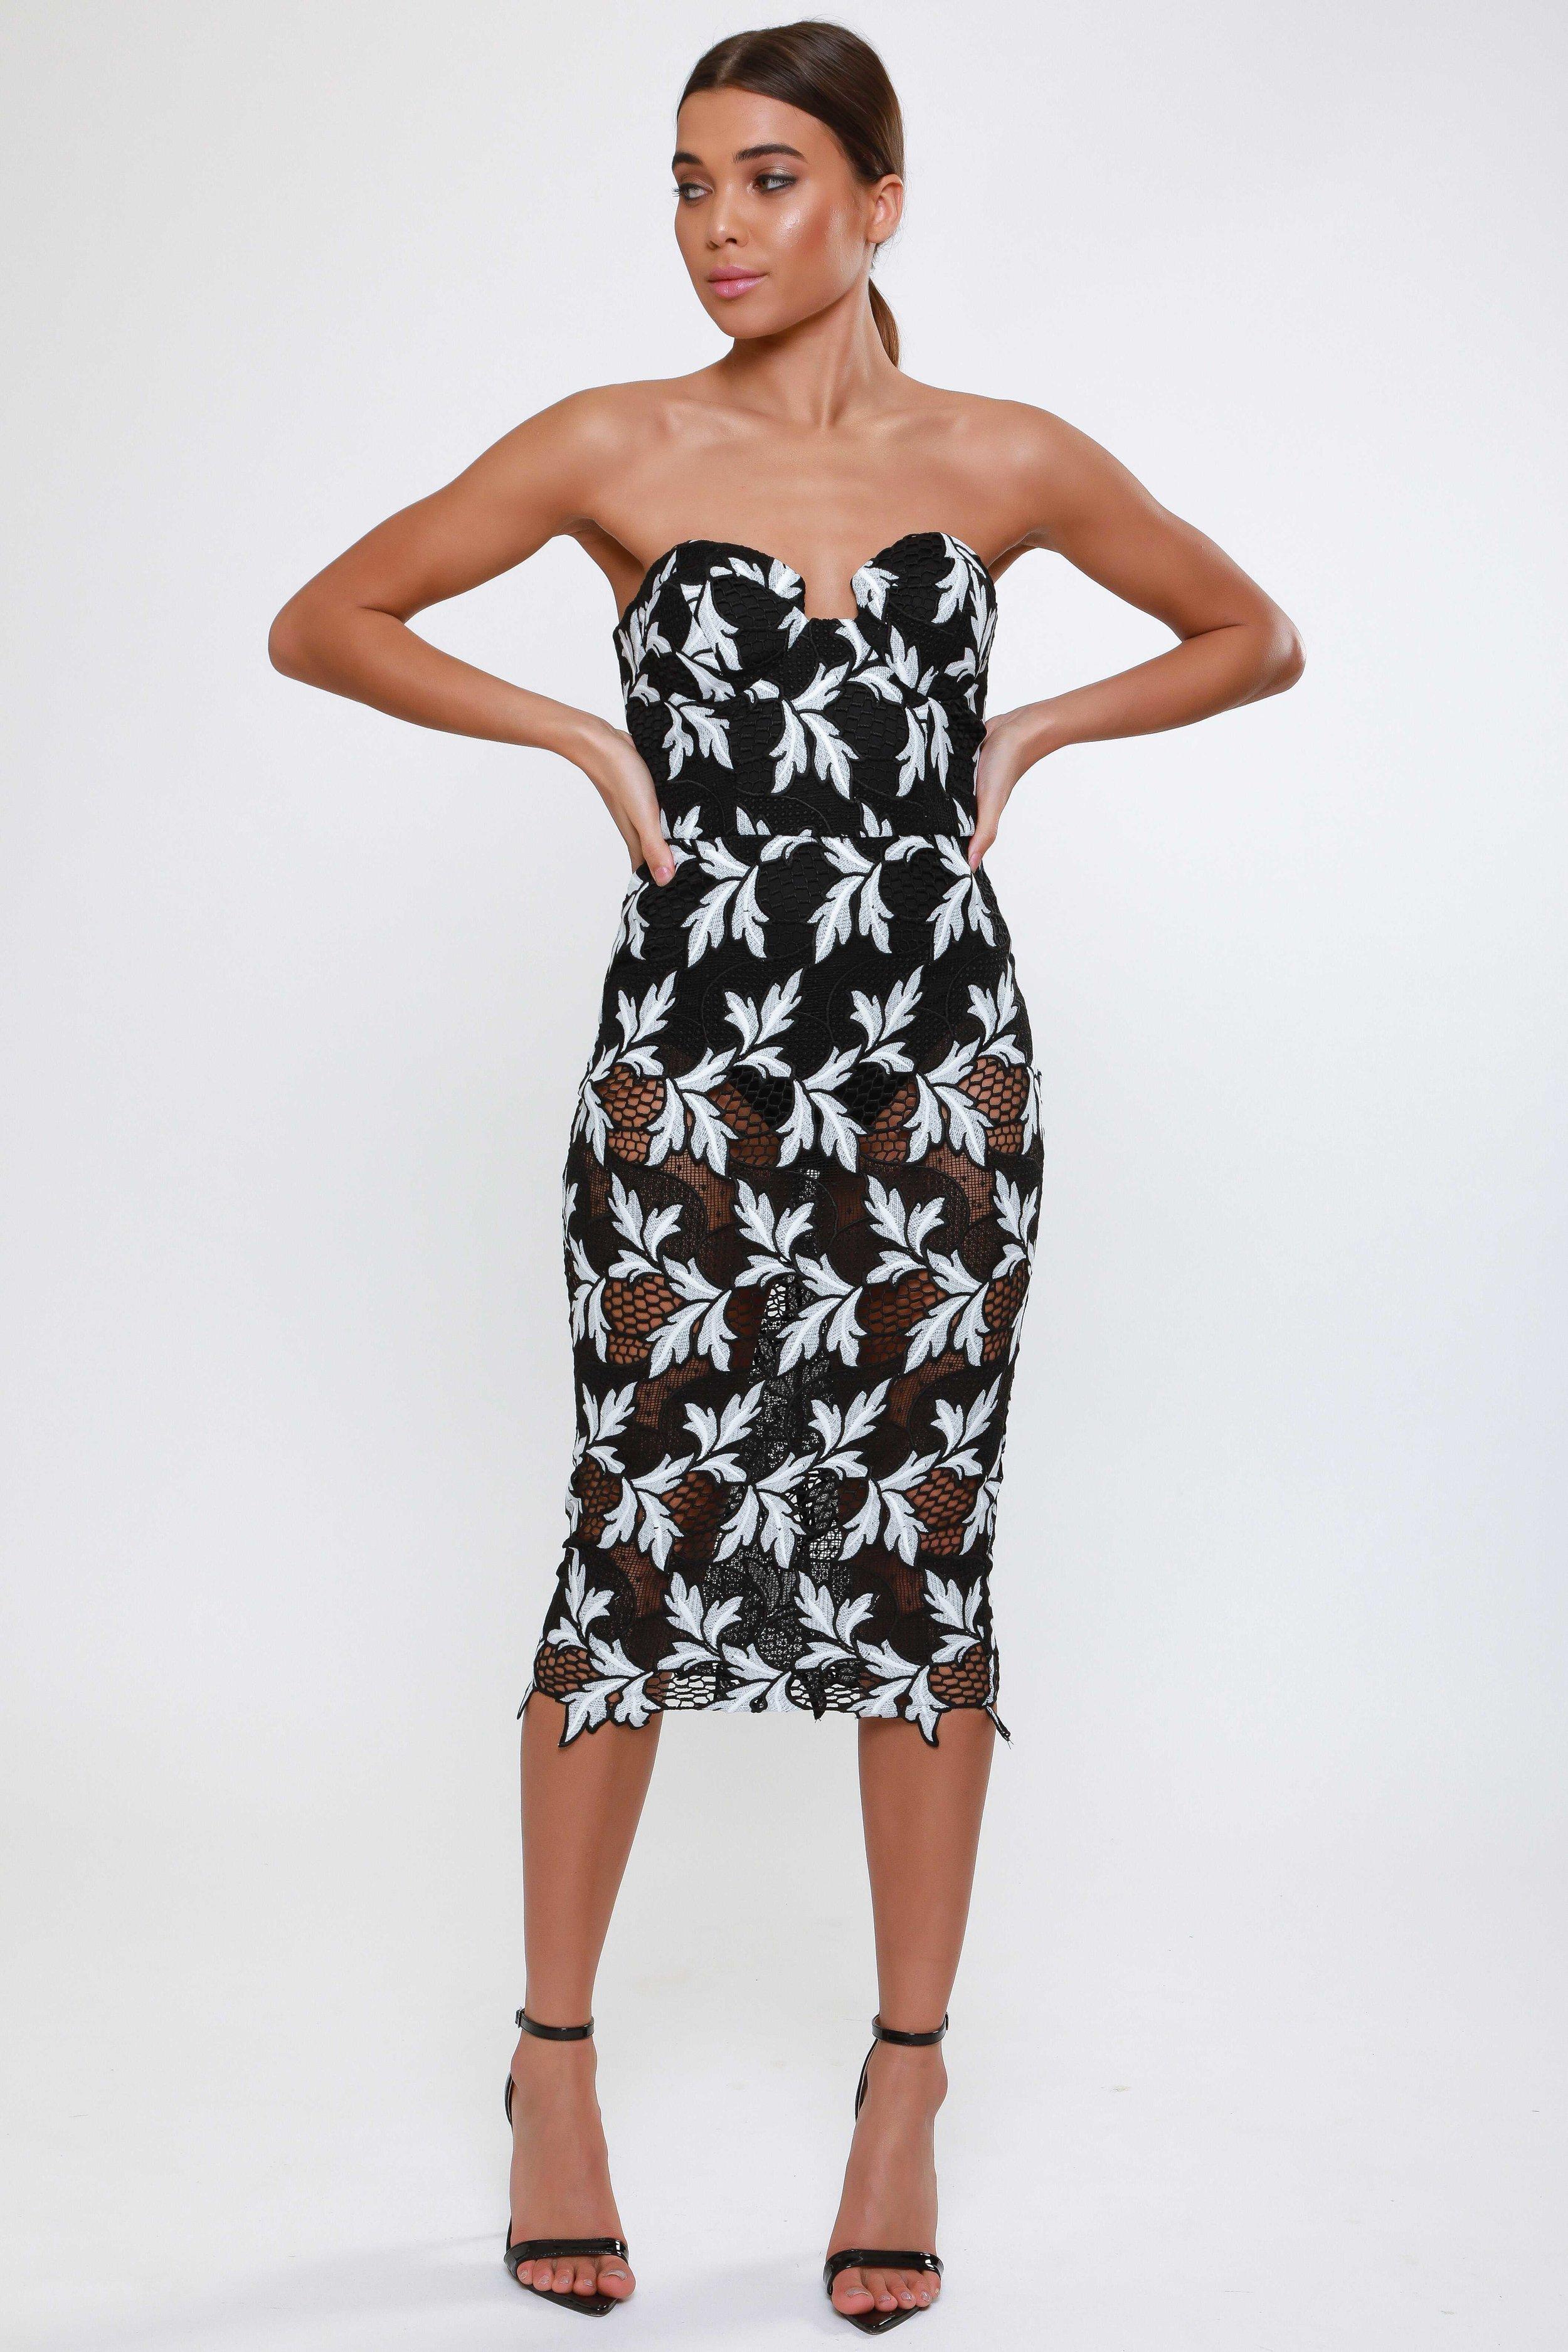 Crochet Lace  Midi Dress   £65.00